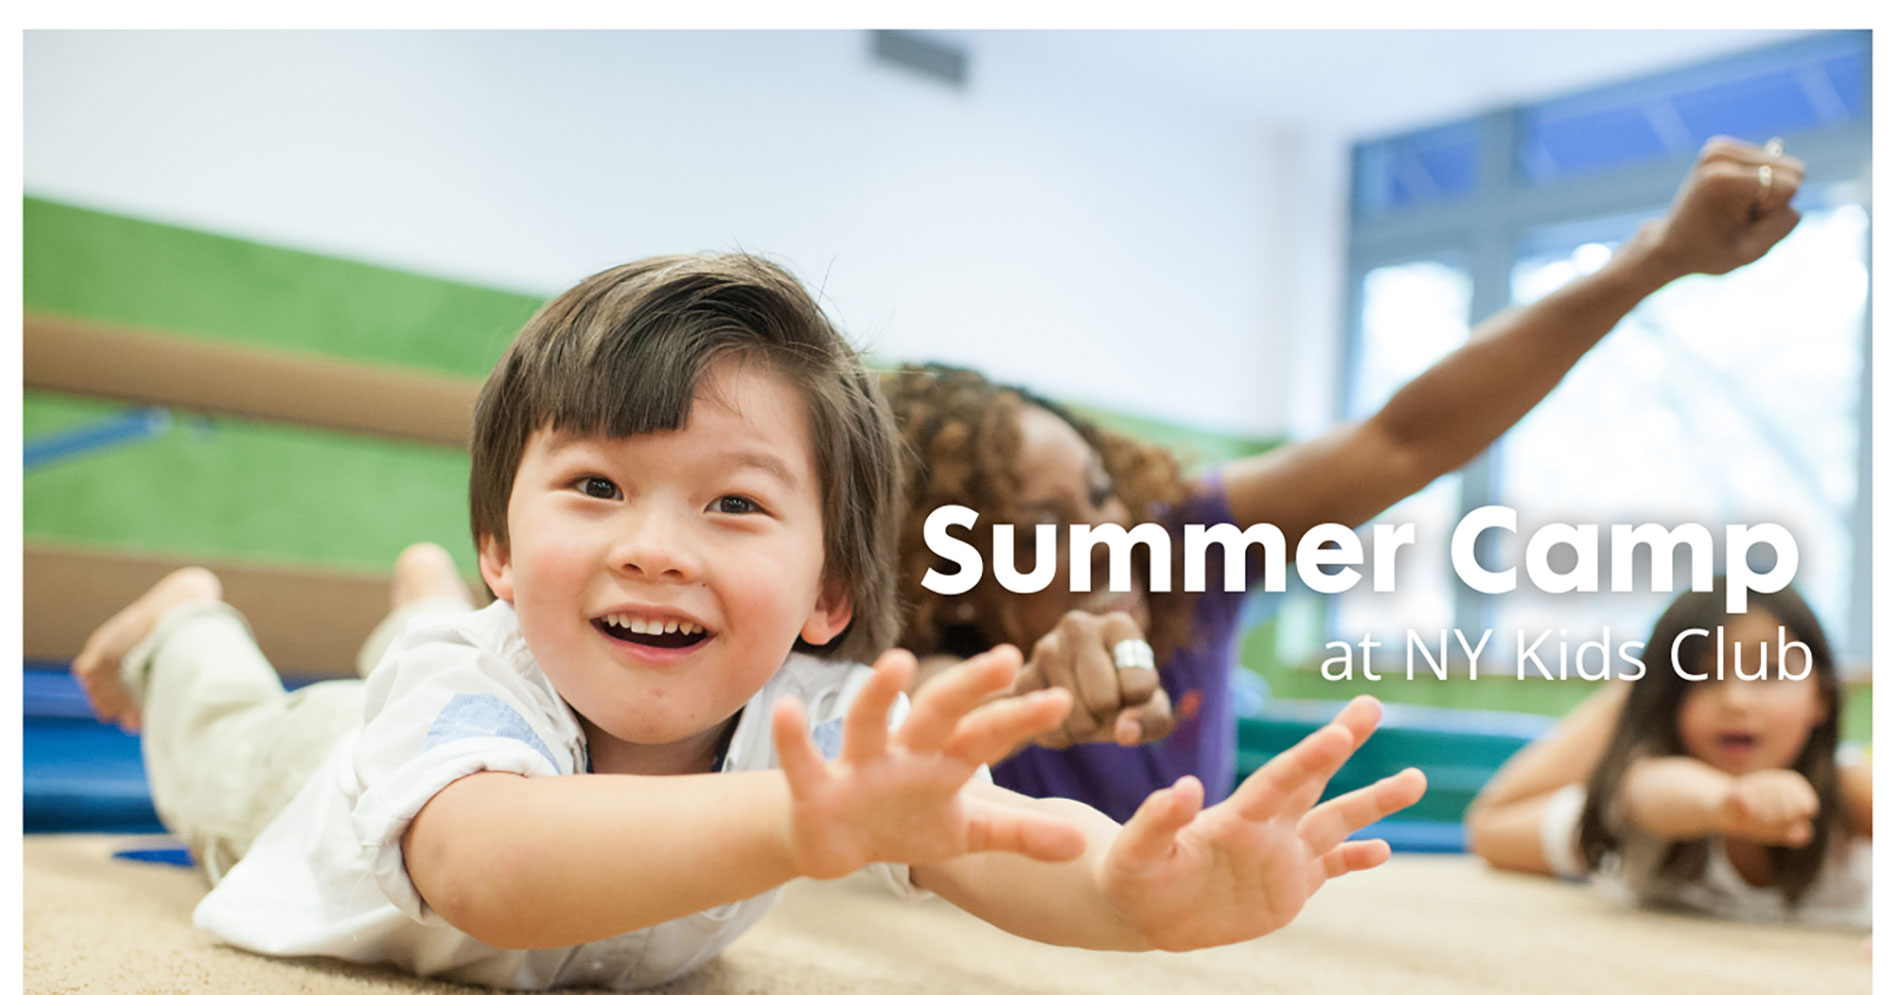 Summer Camp - Now Enrolling